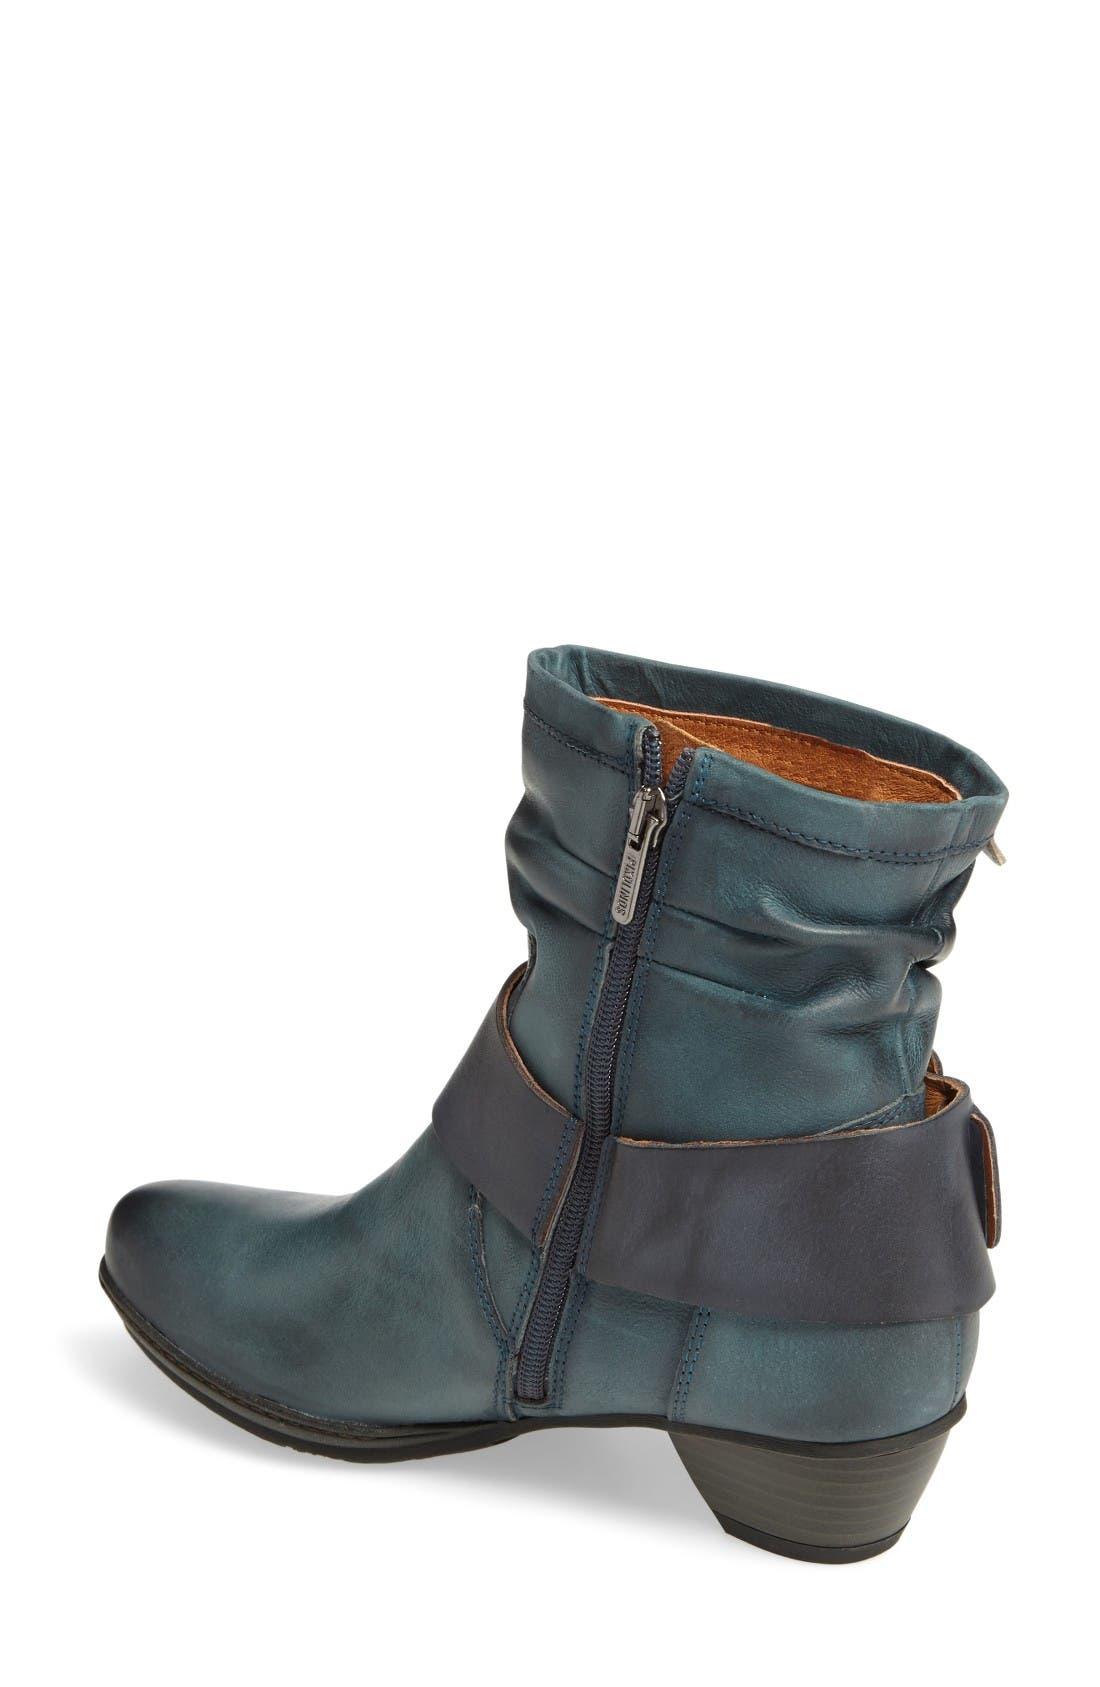 Alternate Image 2  - PIKOLINOS 'Brujas 801' Boot (Women)